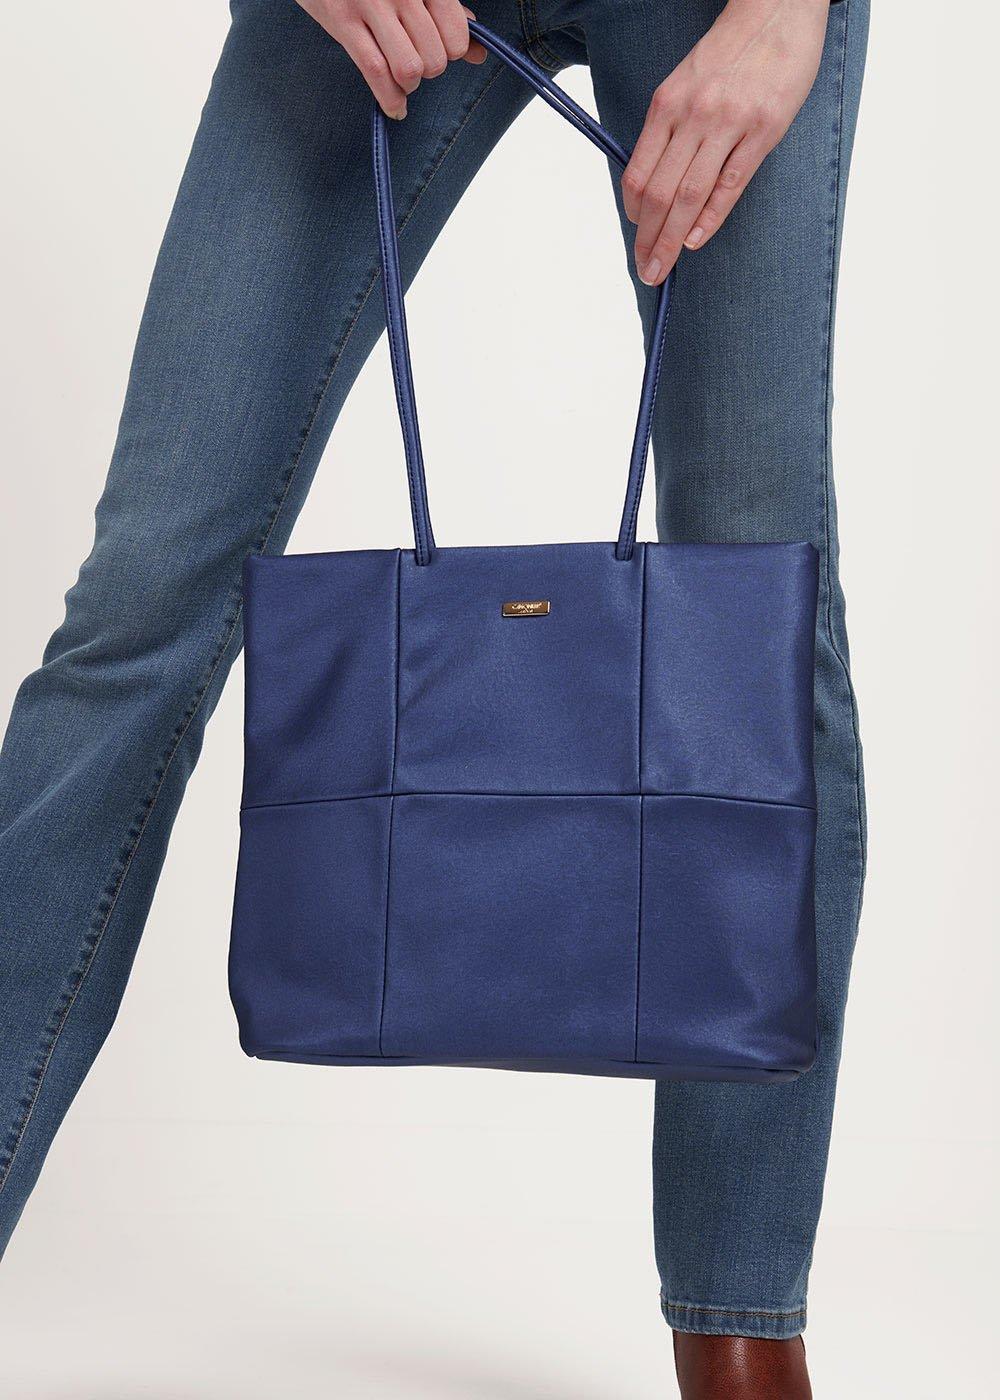 Badel shopping bag with long handle